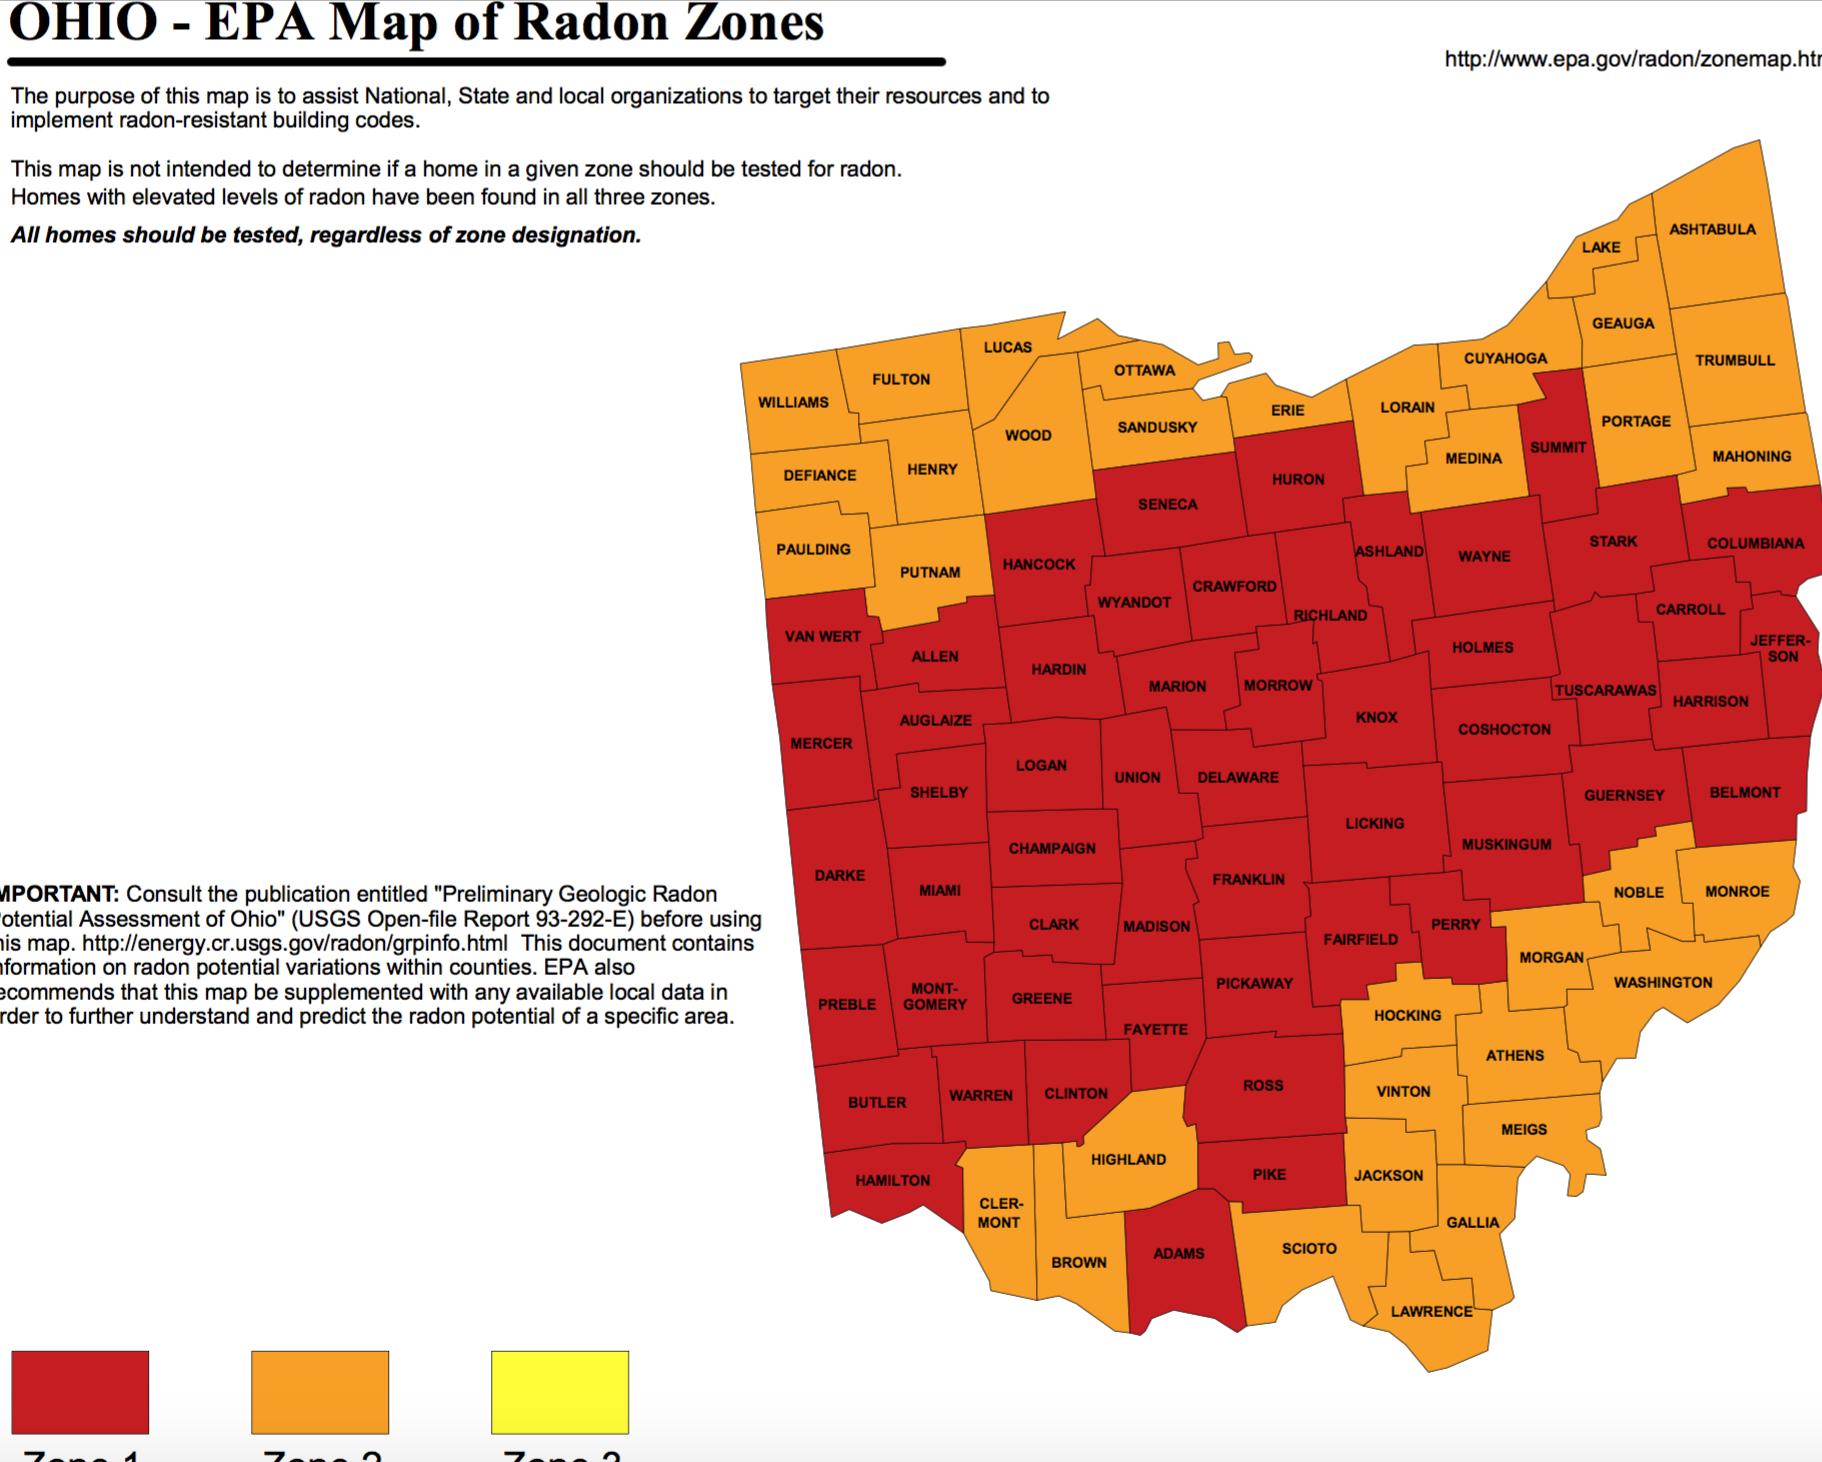 Radon Testing and Mitigation Services in Ohio